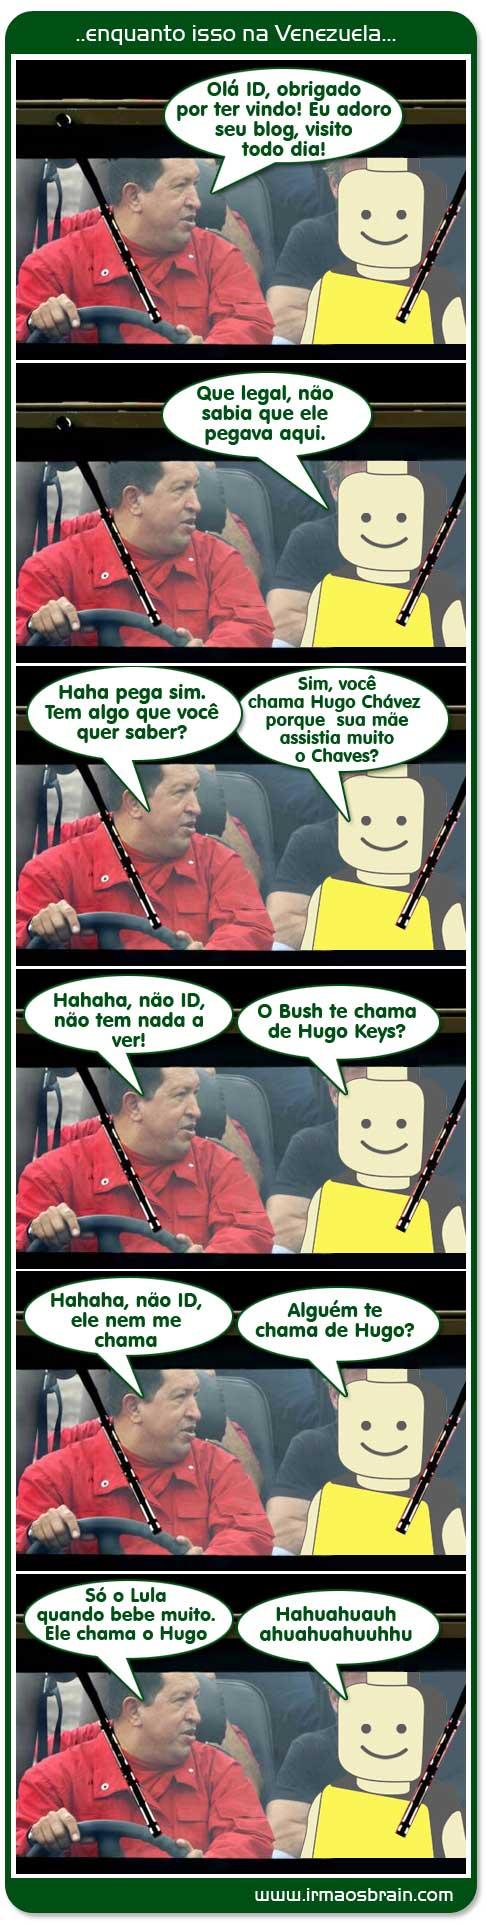 01t0037 Hugo Chavez